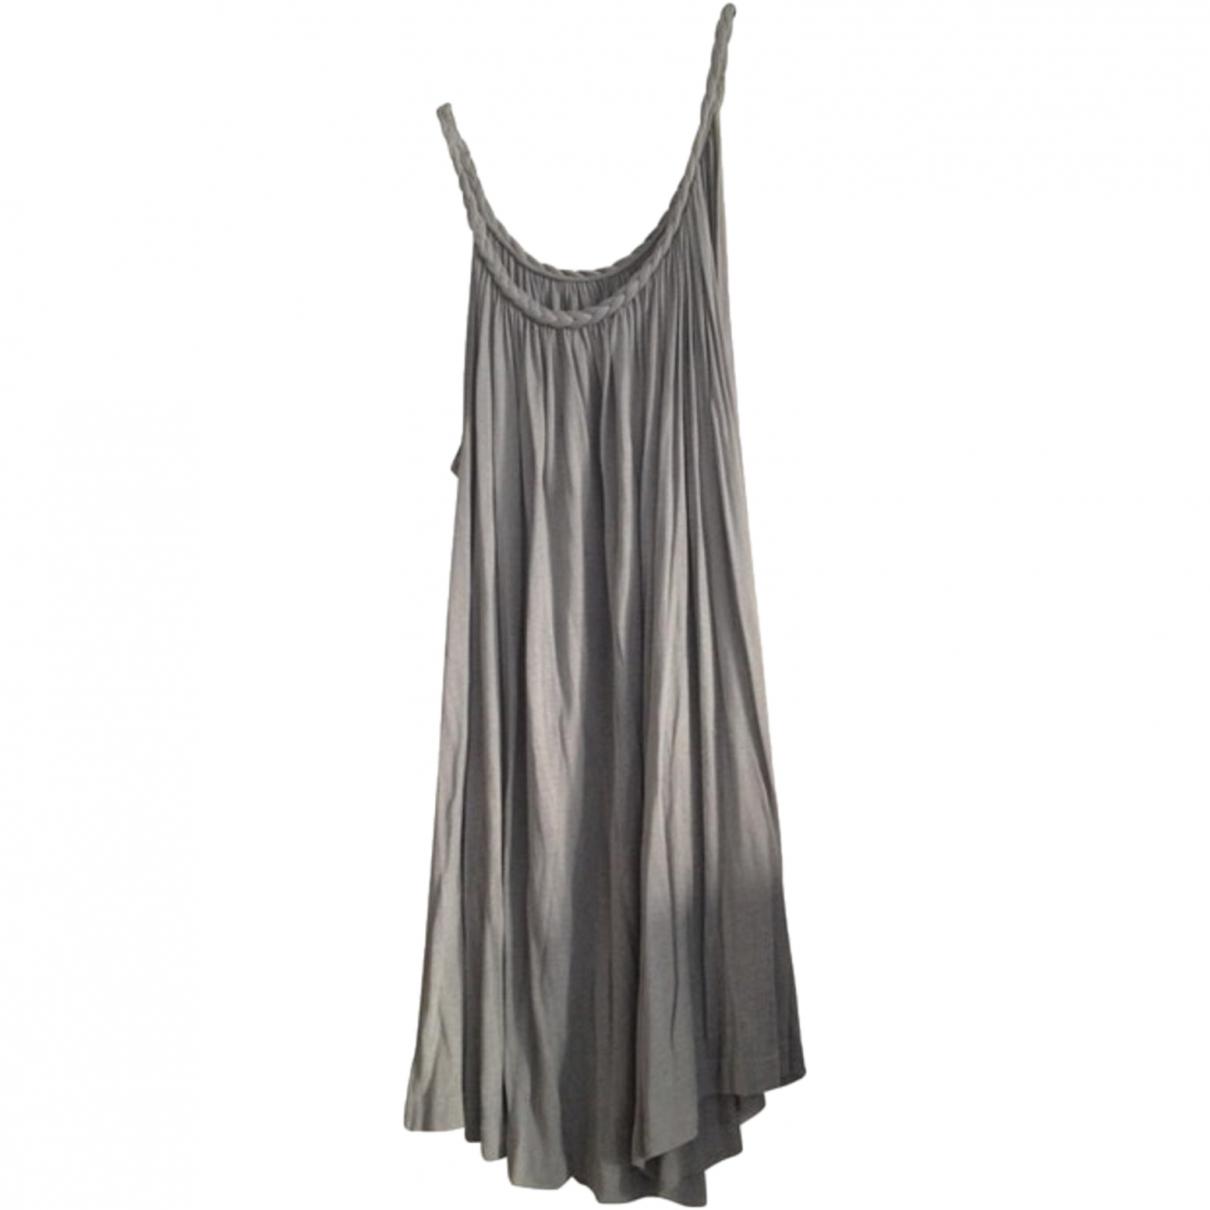 Sandro \N Grey Silk dress for Women One Size FR